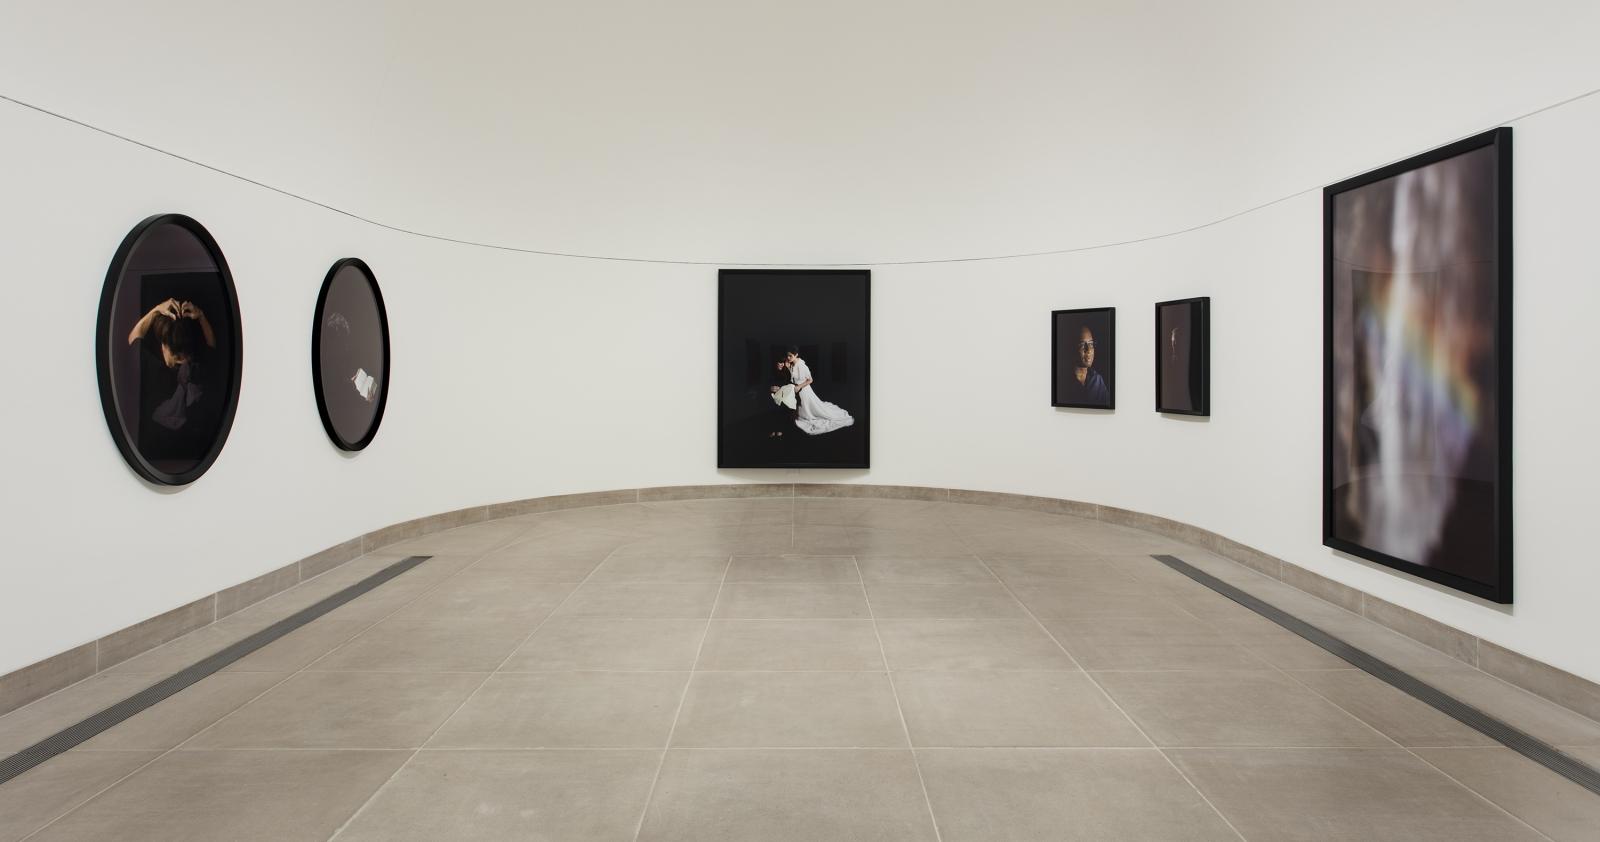 Hammer Projects,嘉芙蓮·奥比: Portraits